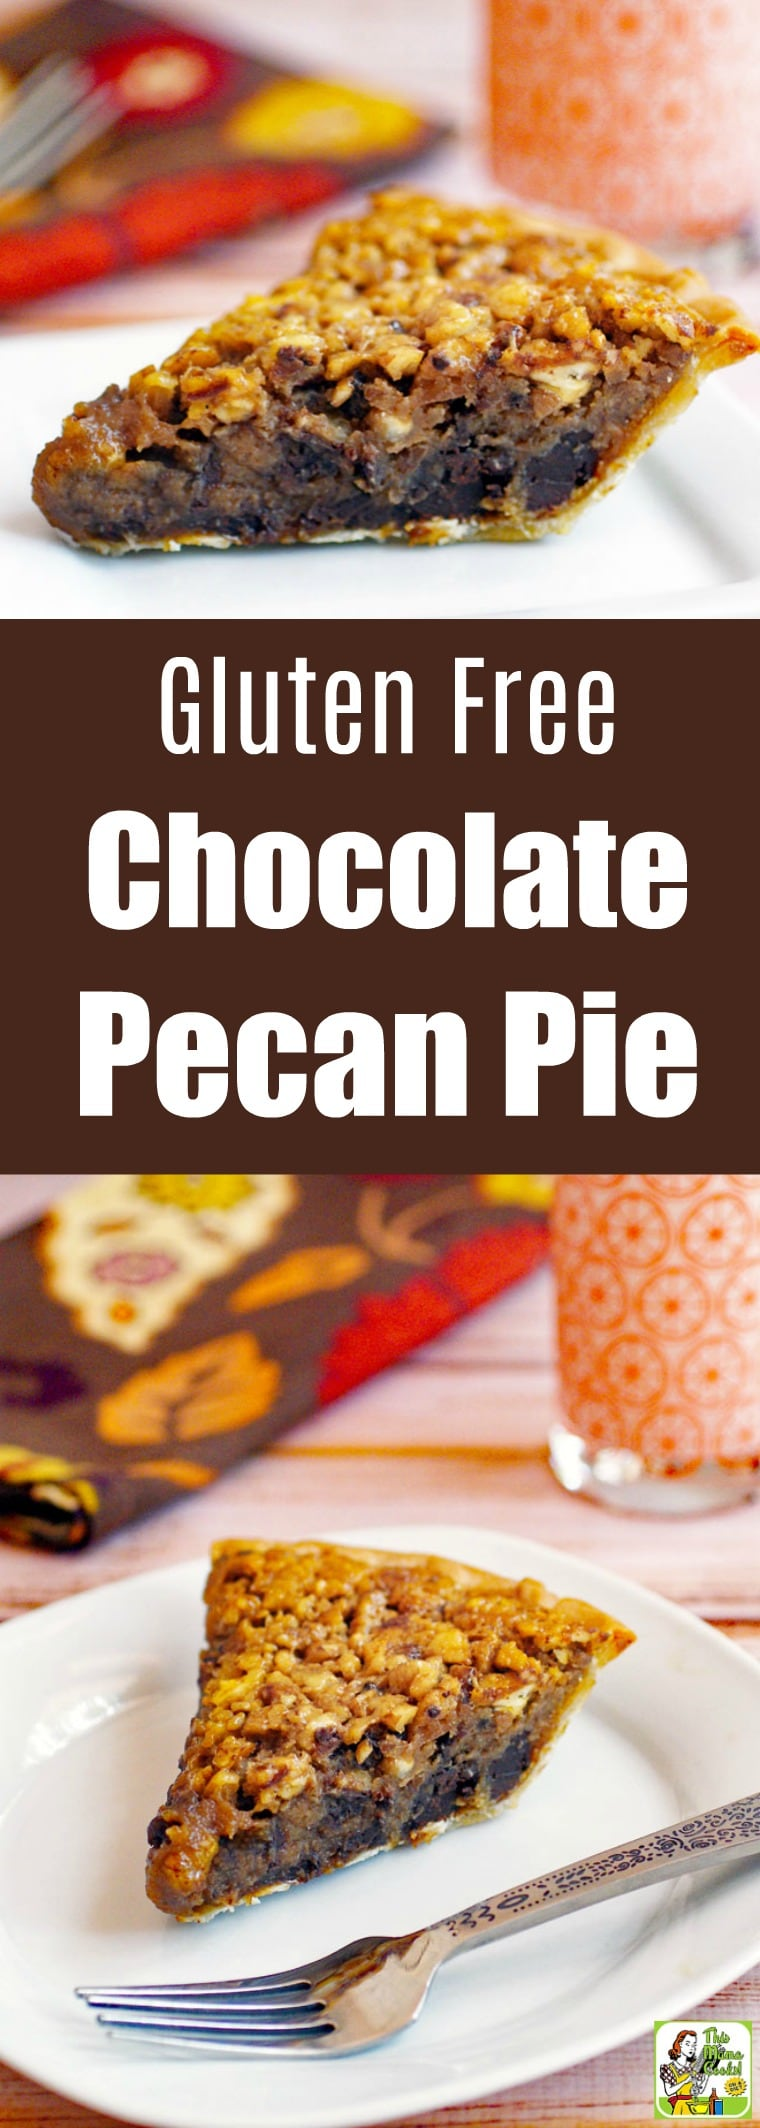 Gluten Free Chocolate Pecan Pie Recipe